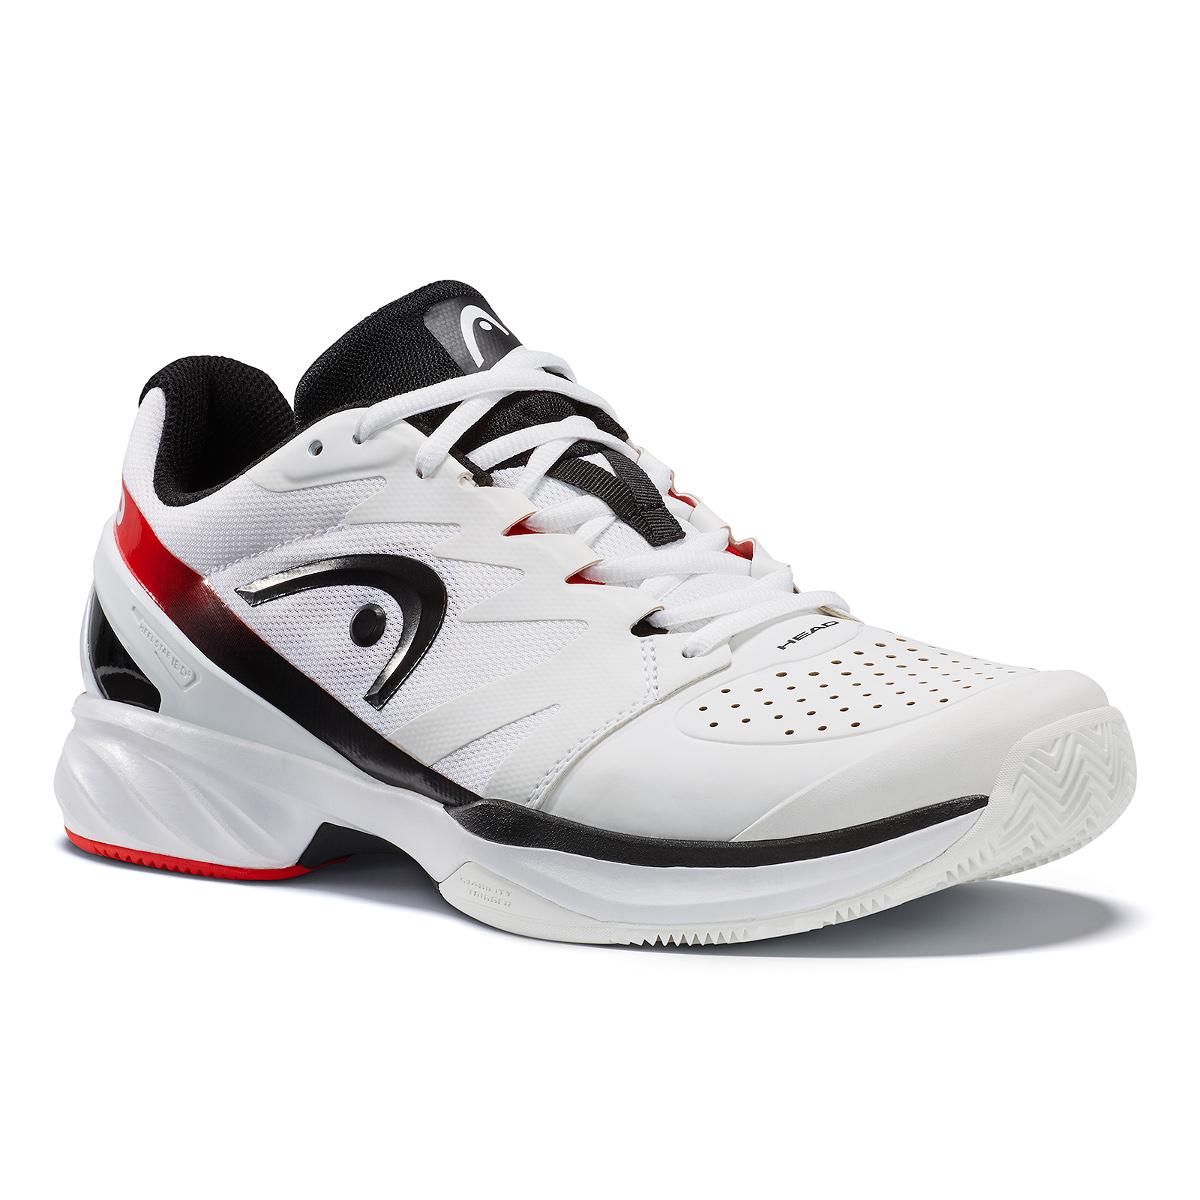 Clay Sprint Tennisschuh Men 2 0 Pro Head thCxdQrs